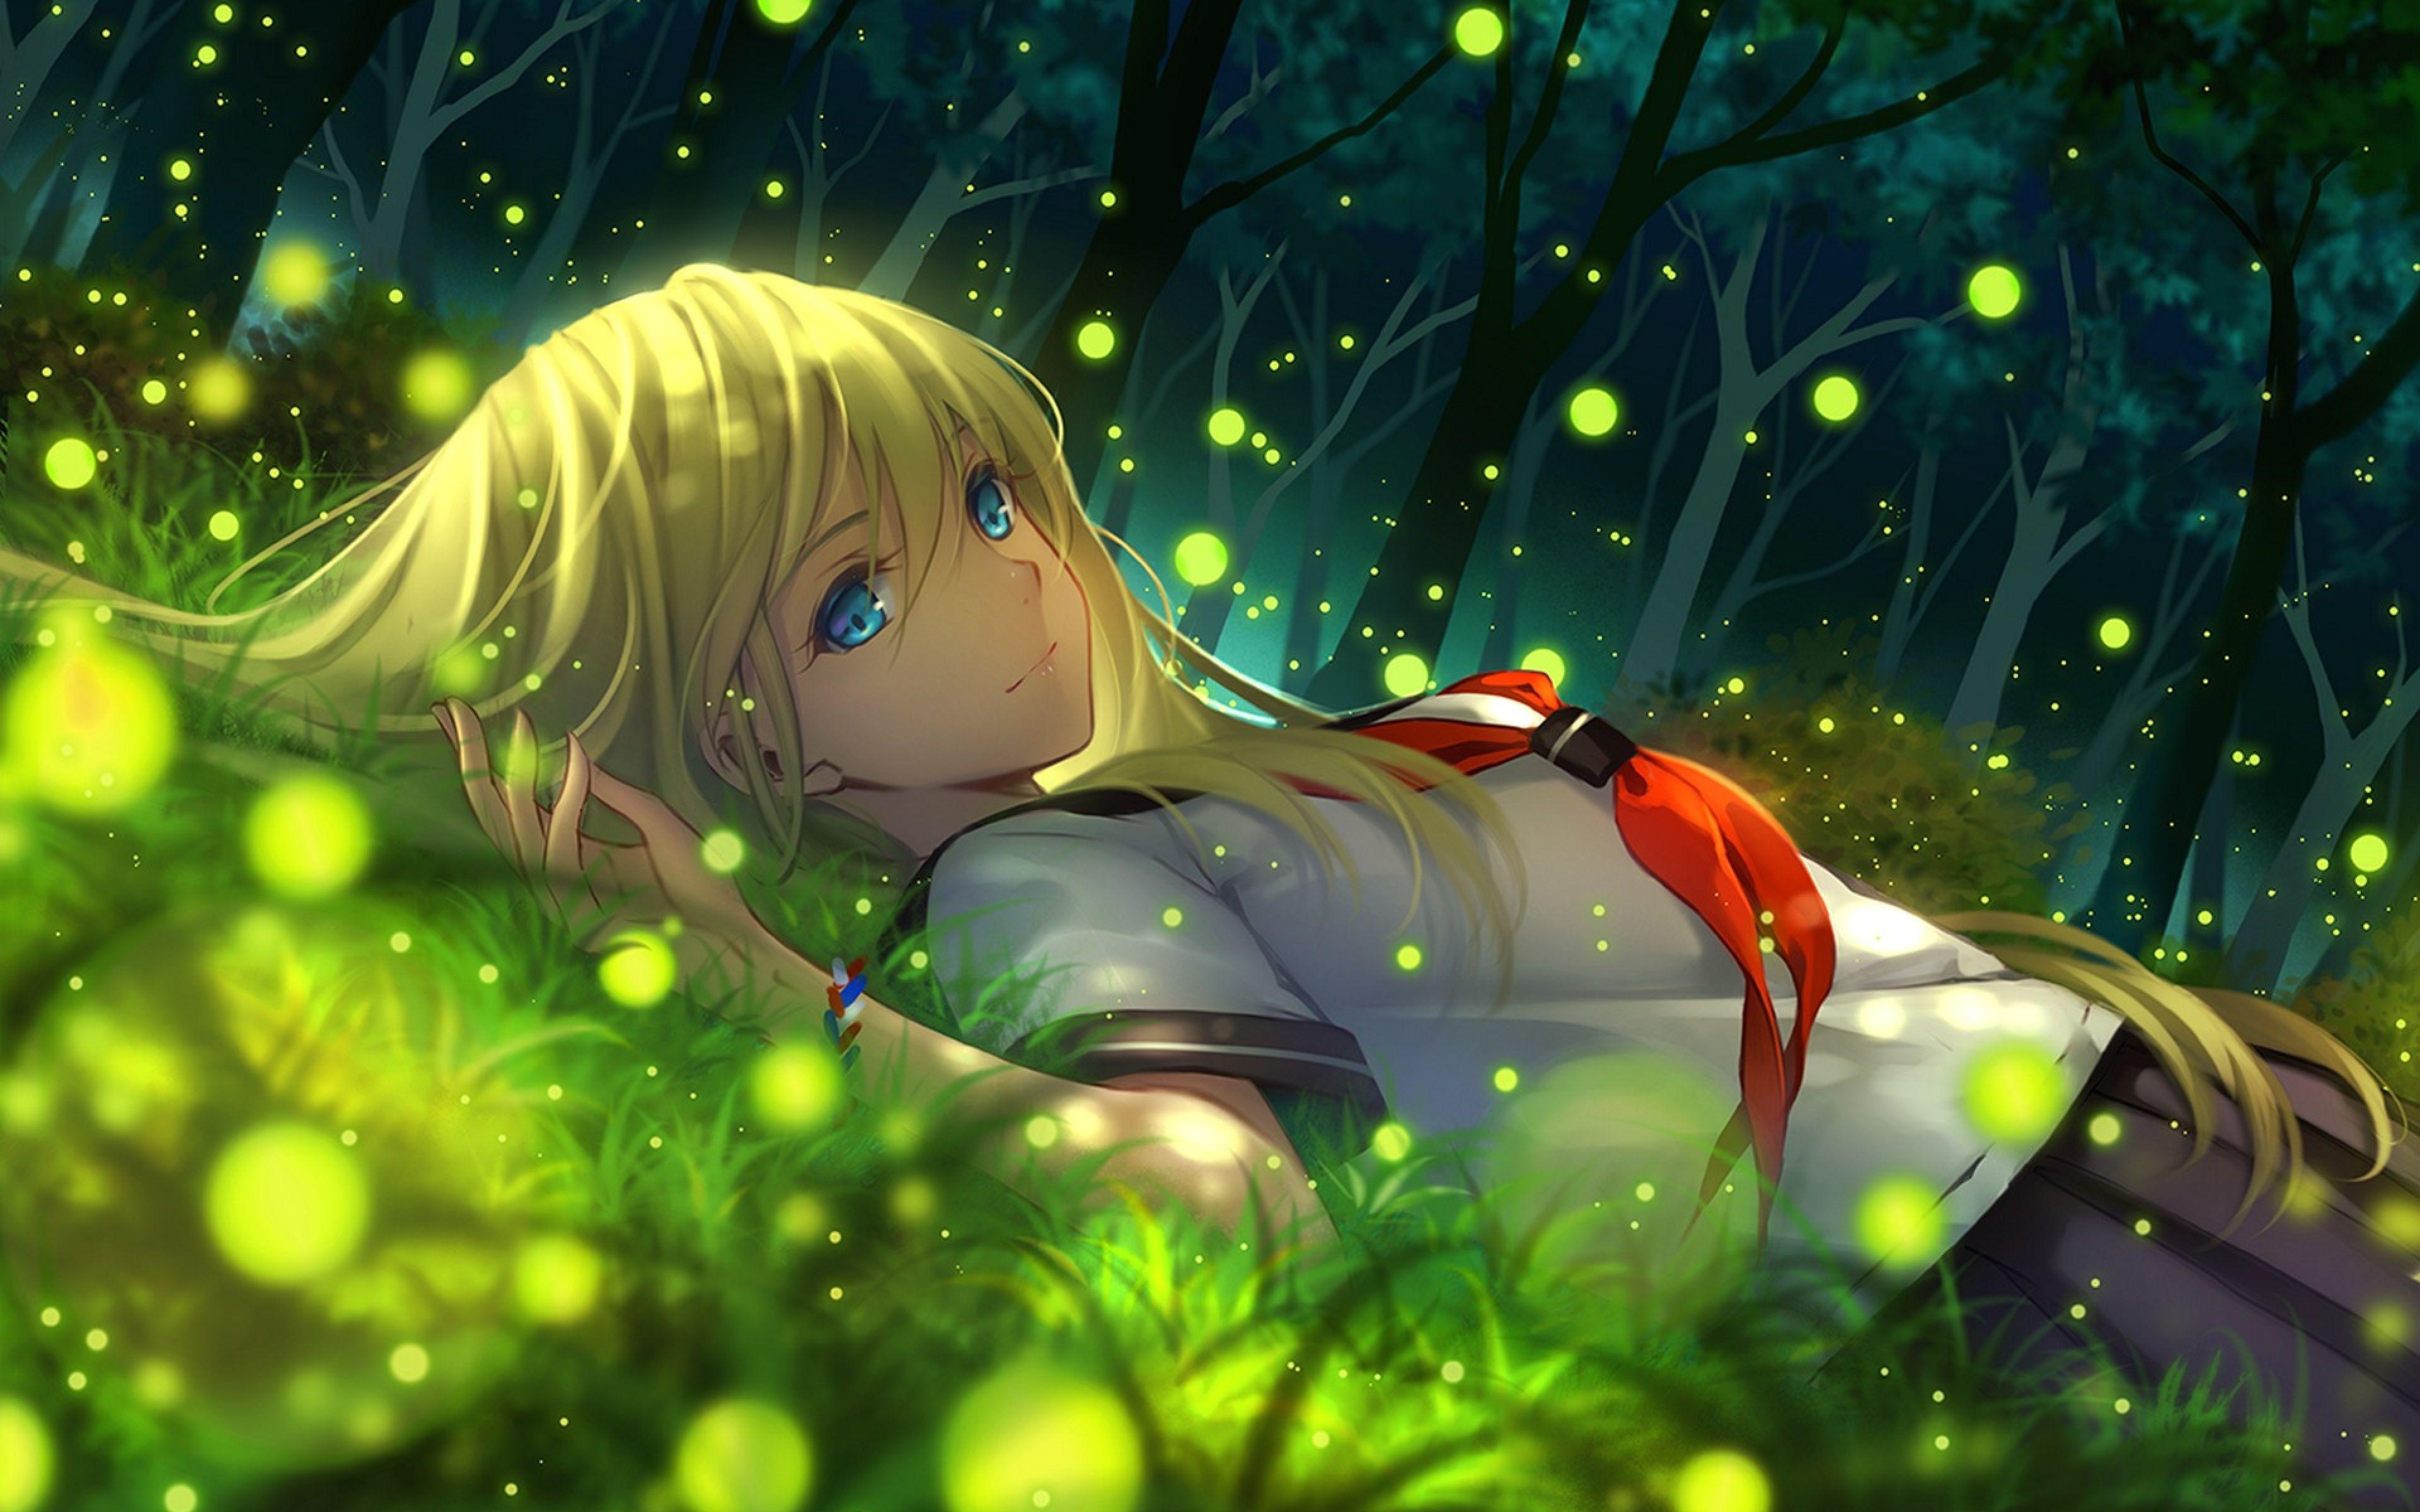 3840x2400 Wallpaper Girl Anime Grass Lying Art Ilustrasi Manga Gadis Animasi Ilustrasi